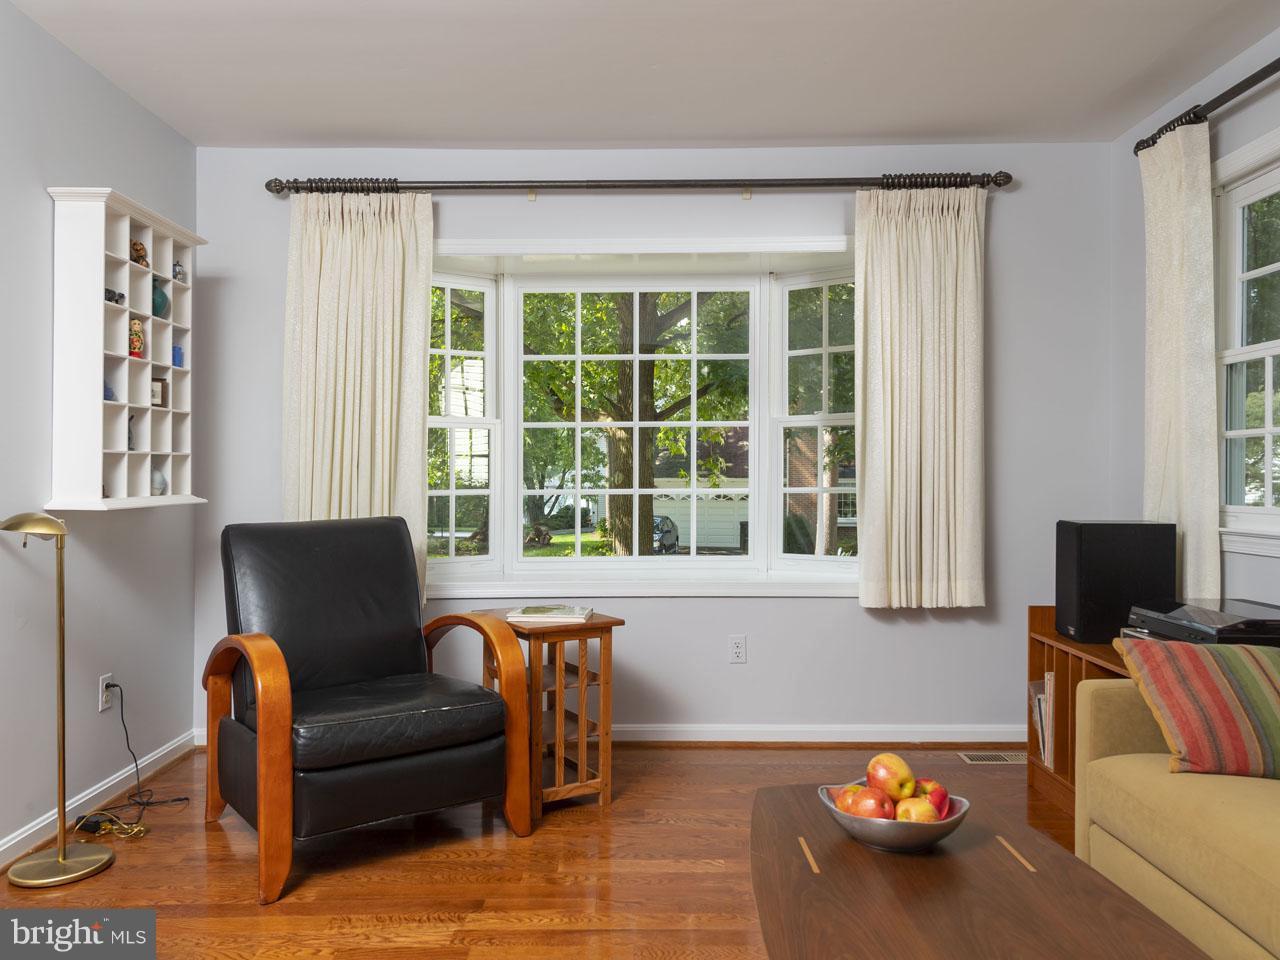 1006211278-300688039239-2021-07-22-07-39-39        Burke Delaware Real Estate For Sale   MLS# 1006211278  - Best of Northern Virginia